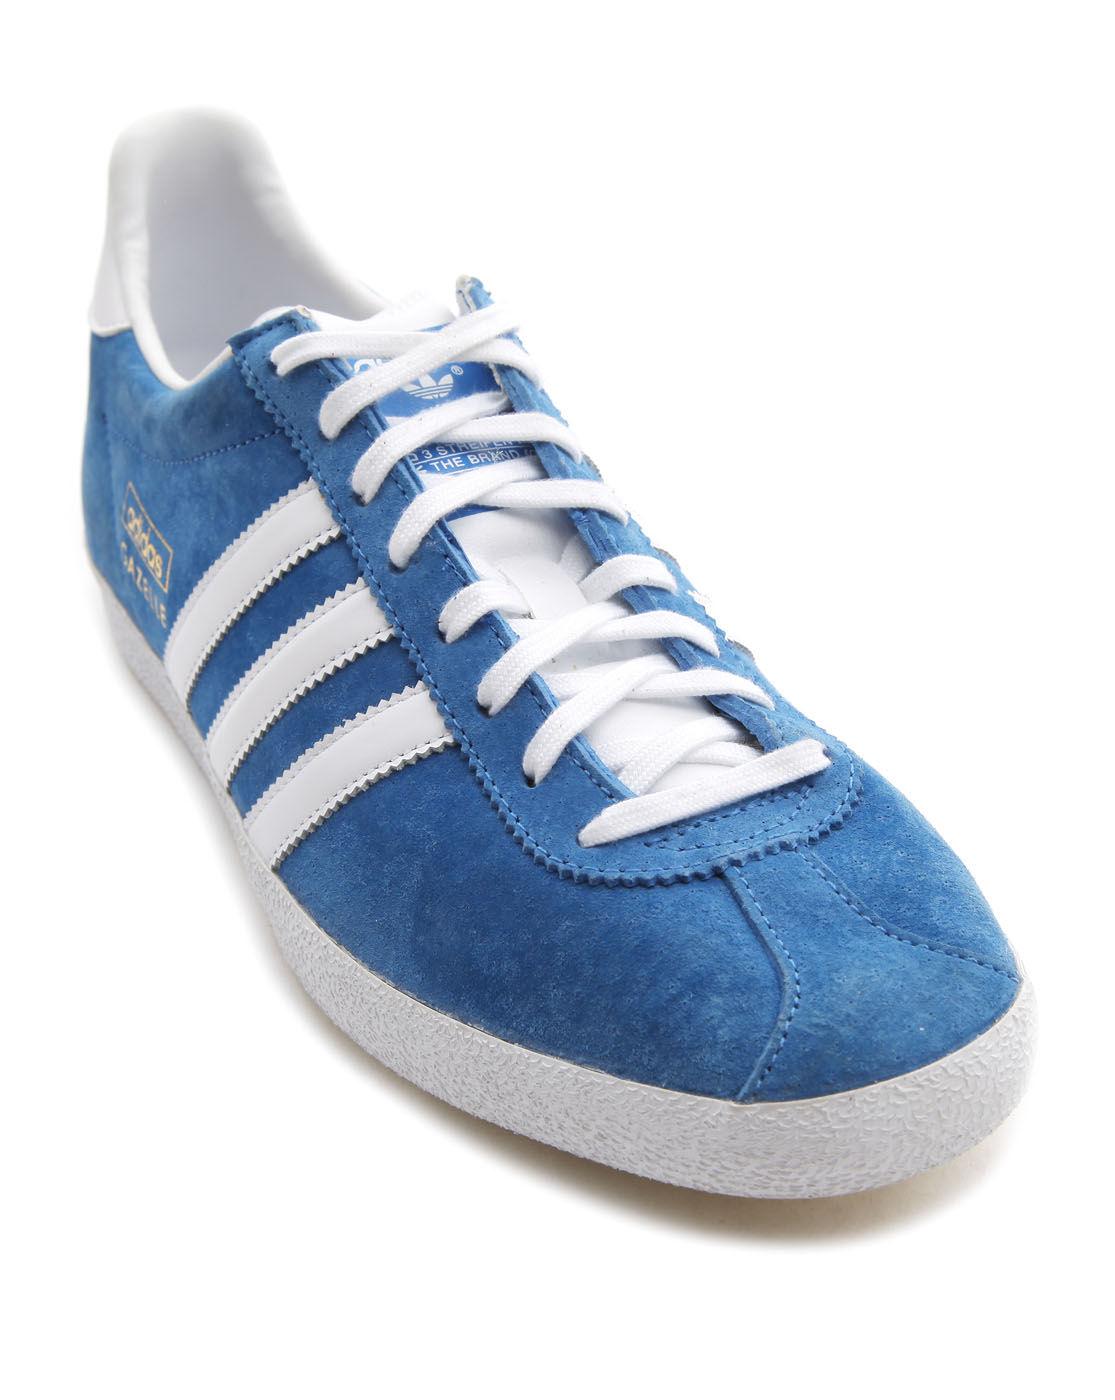 Adidas Originals Gazelle Og Blue Sneakers